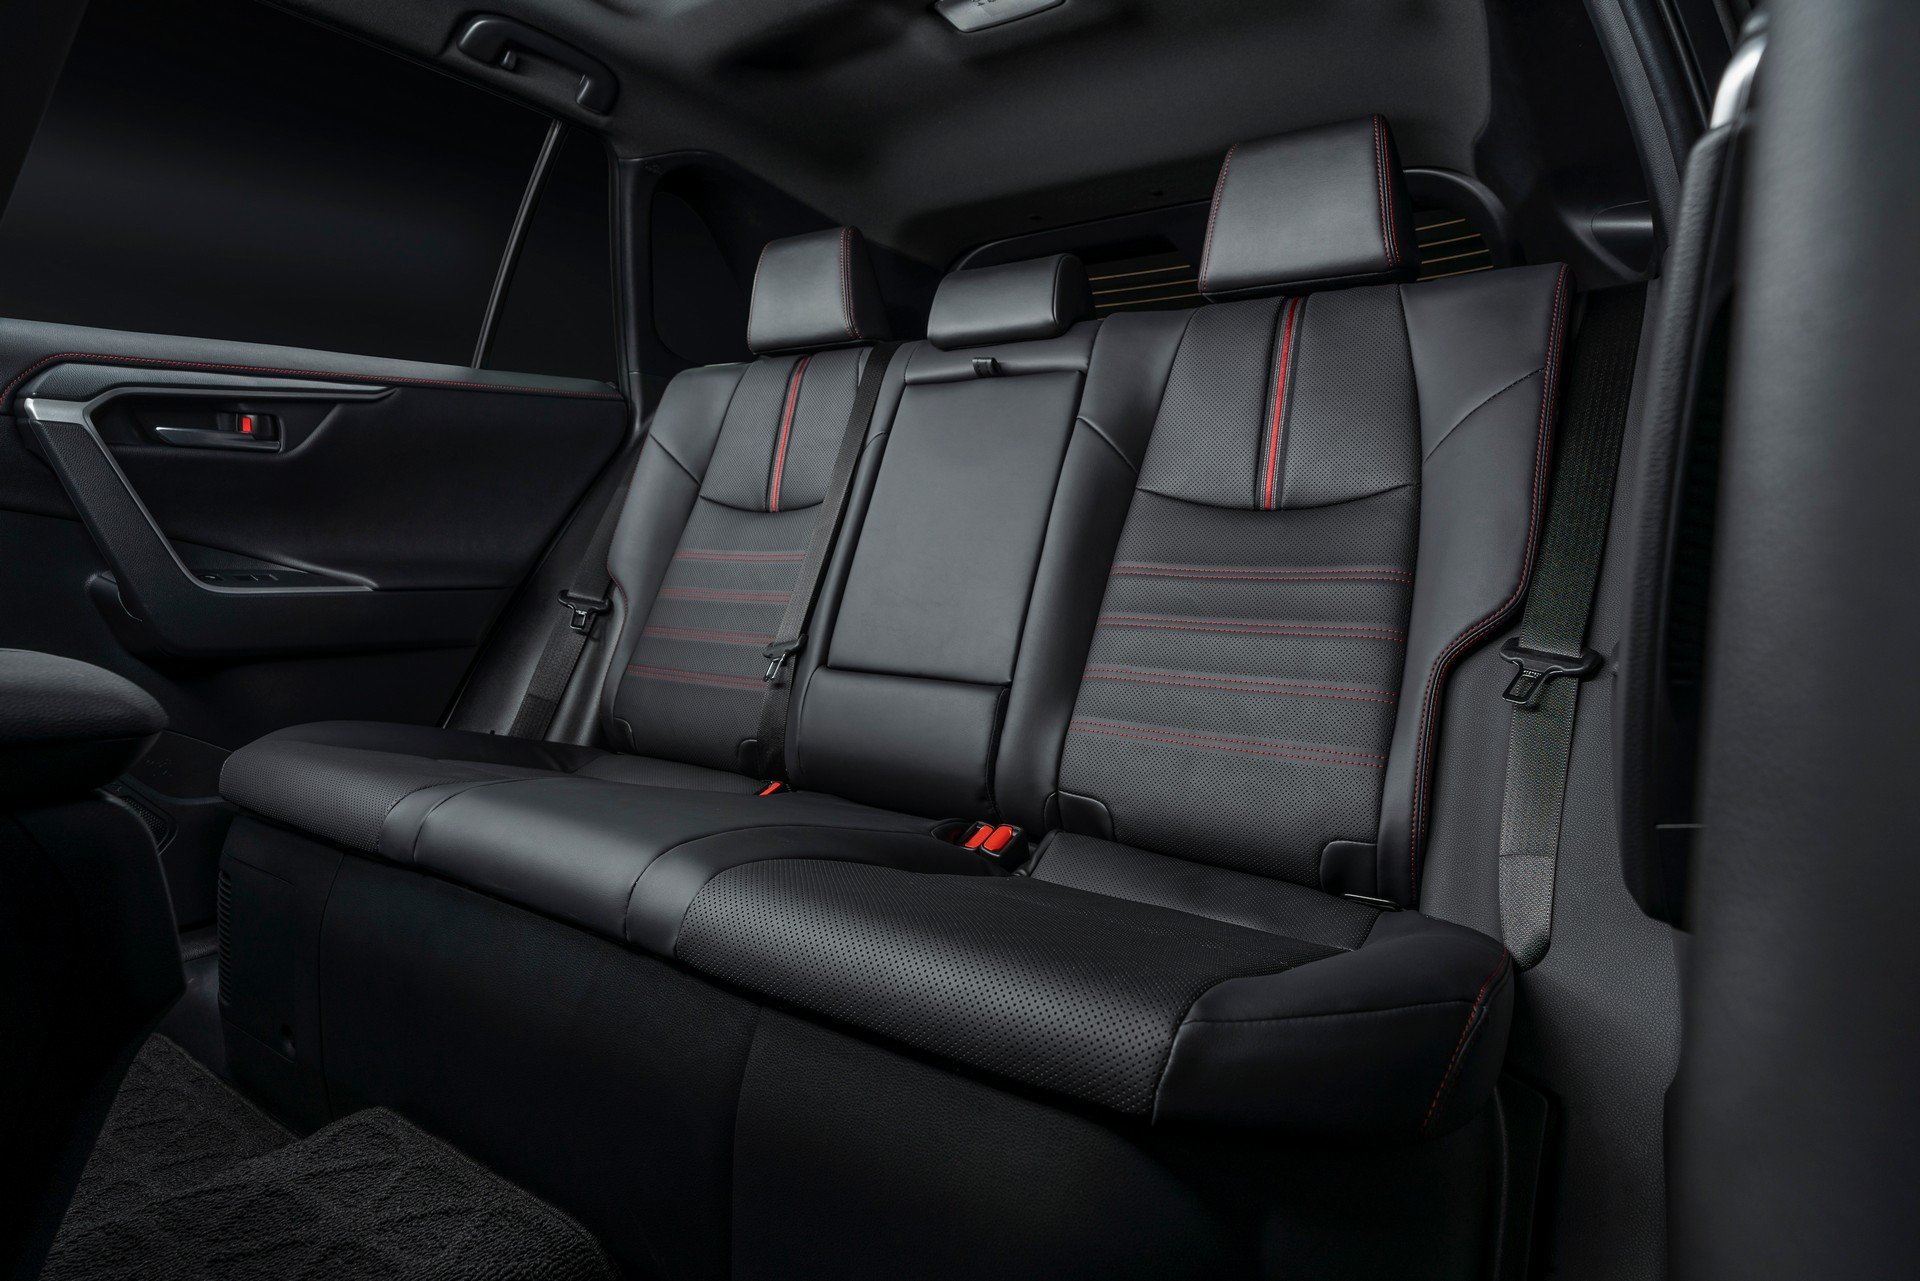 Toyota-RAV4-Plug-in-Hybrid-Prime-2020-29